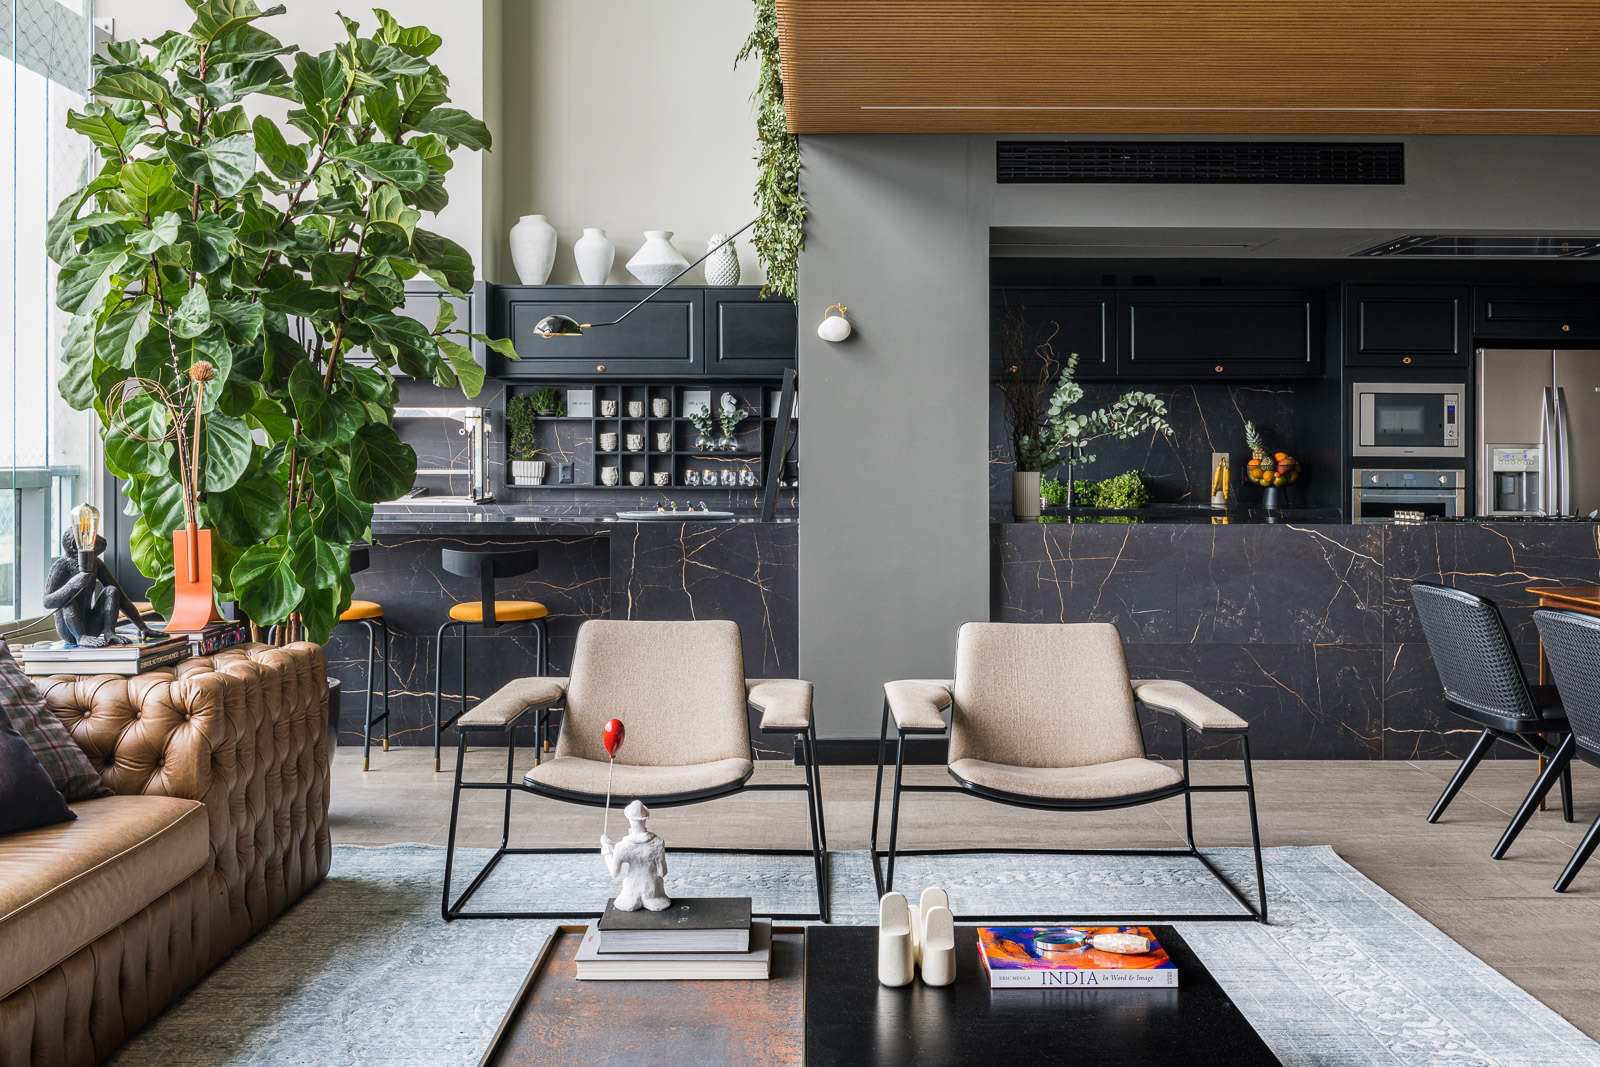 metcha penthouse Shirlei-Proenca inner 8 - IMAGE